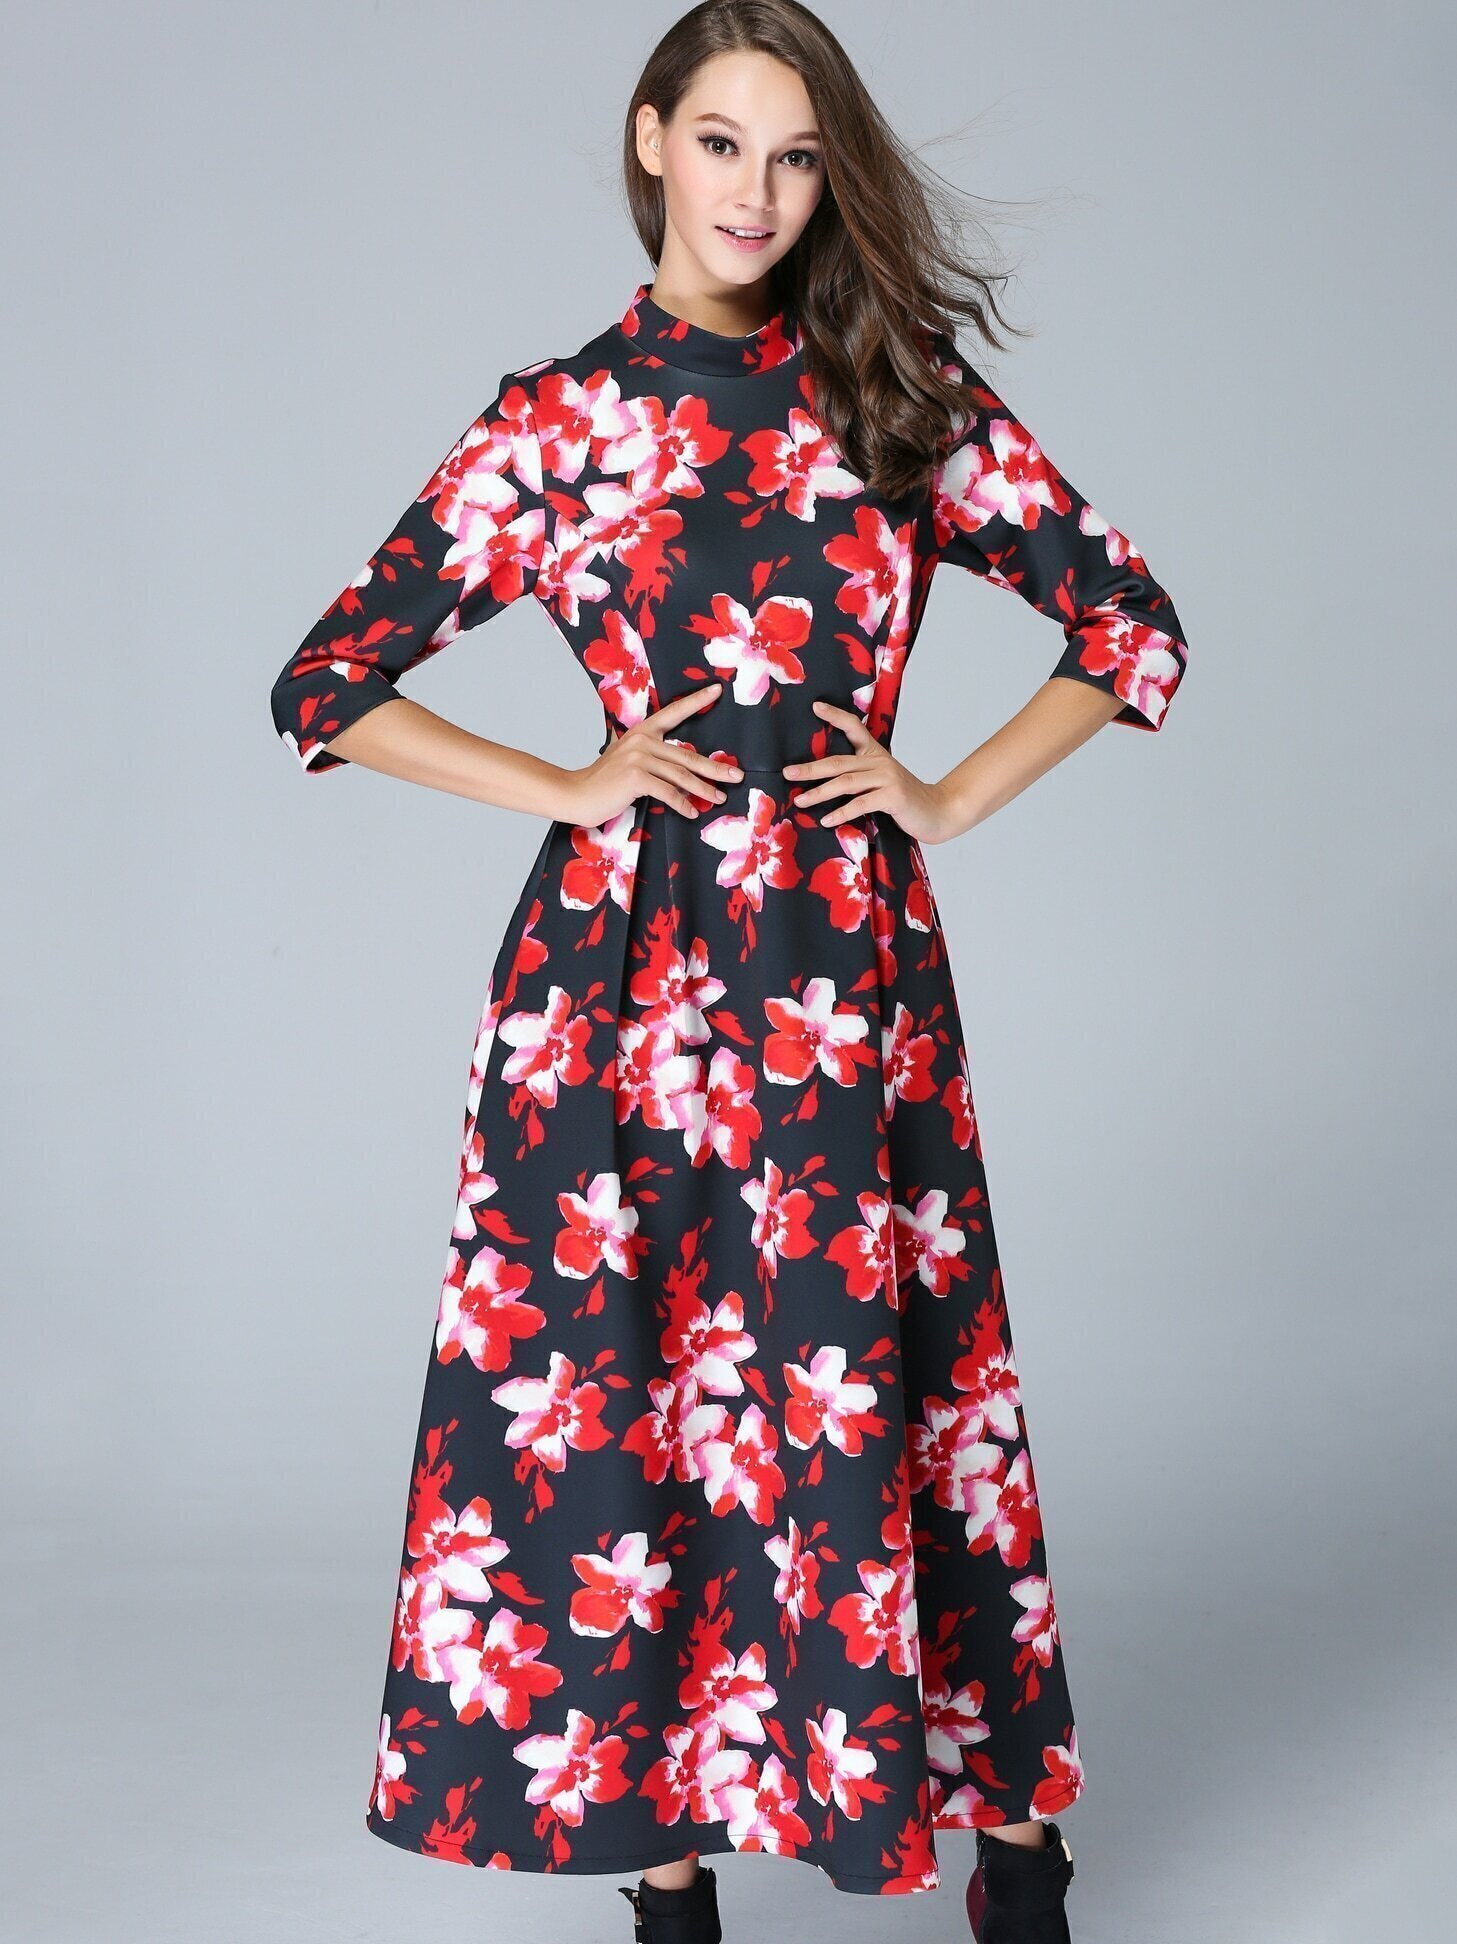 Black Stand Collar Half Sleeve Print Dress